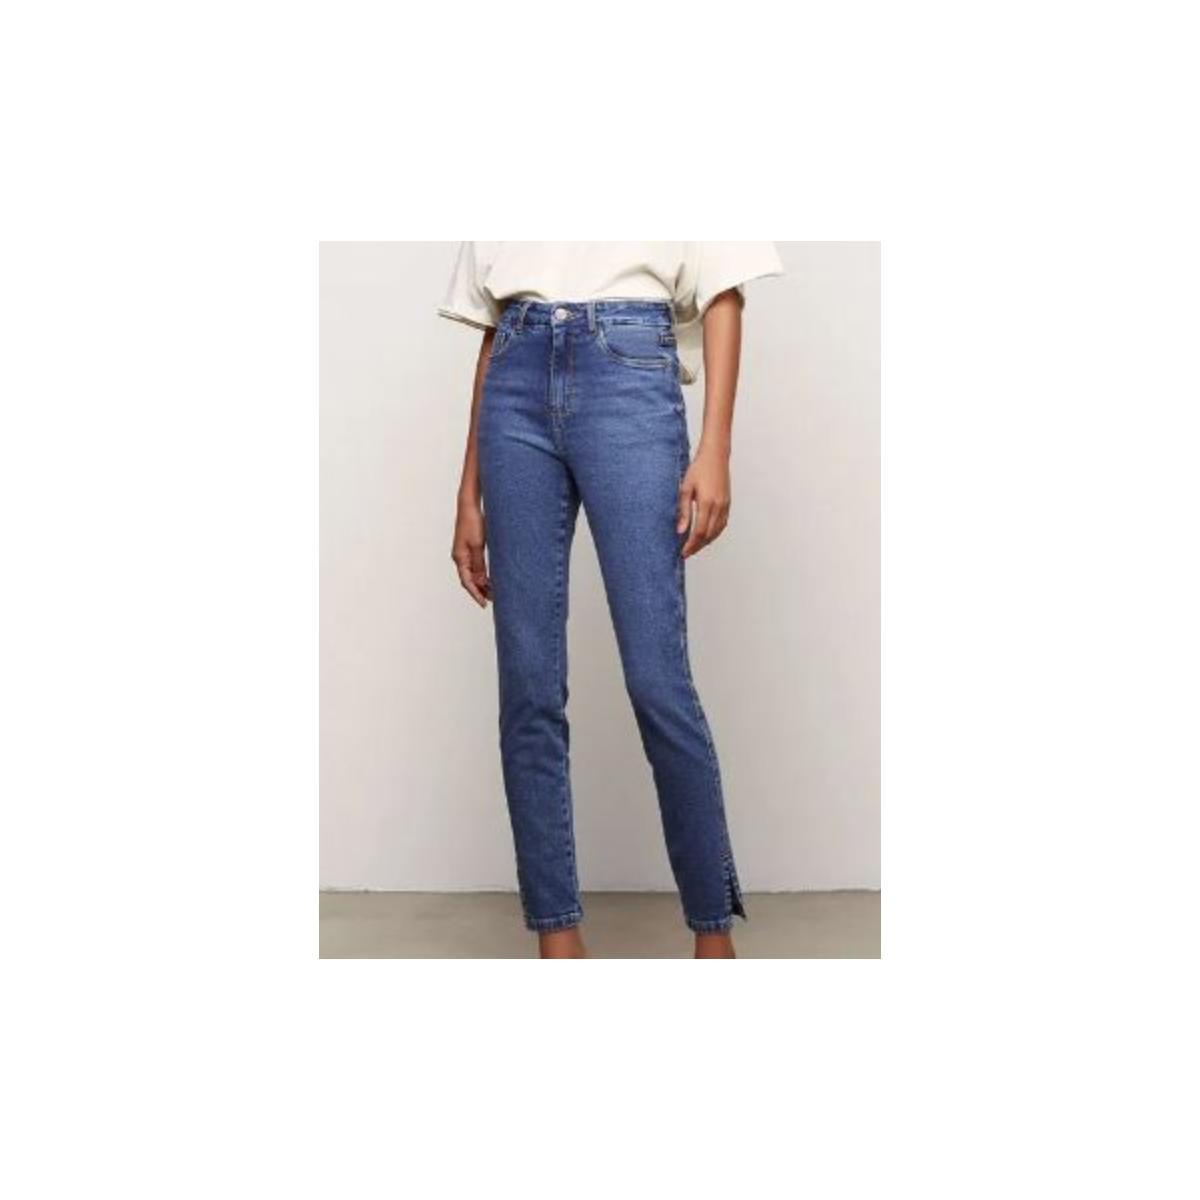 Calça Feminina Dzarm Zua2 1asn  Jeans